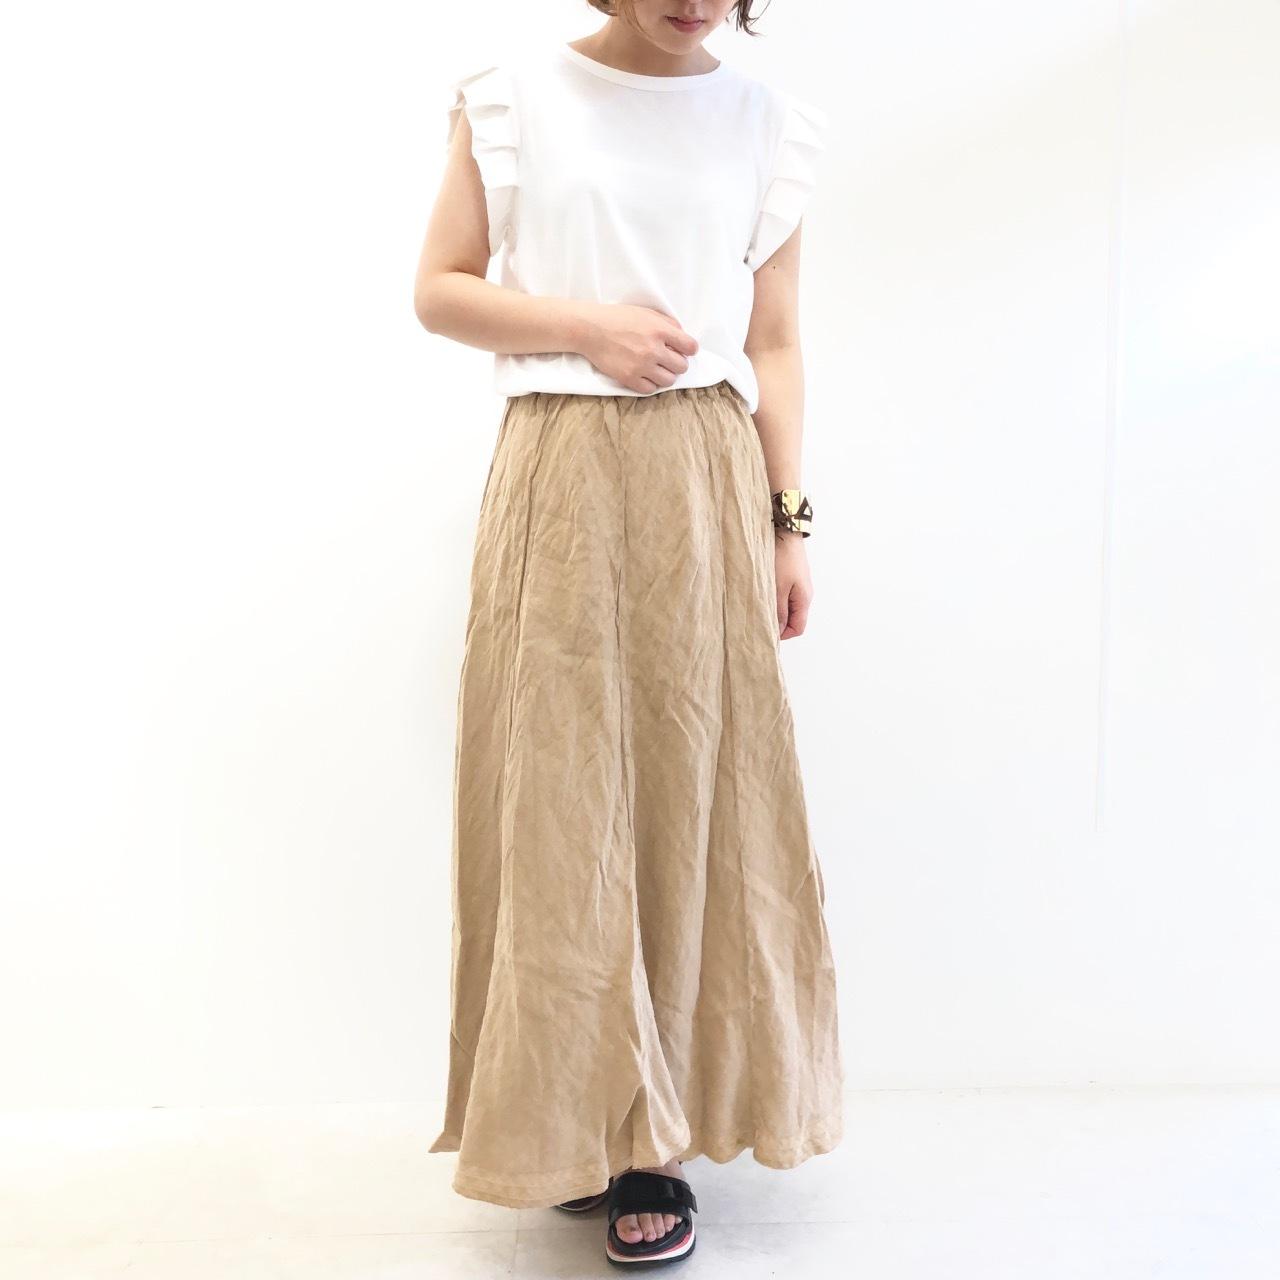 【 Valance select 】- 210277 -シワ加工リネンスカート